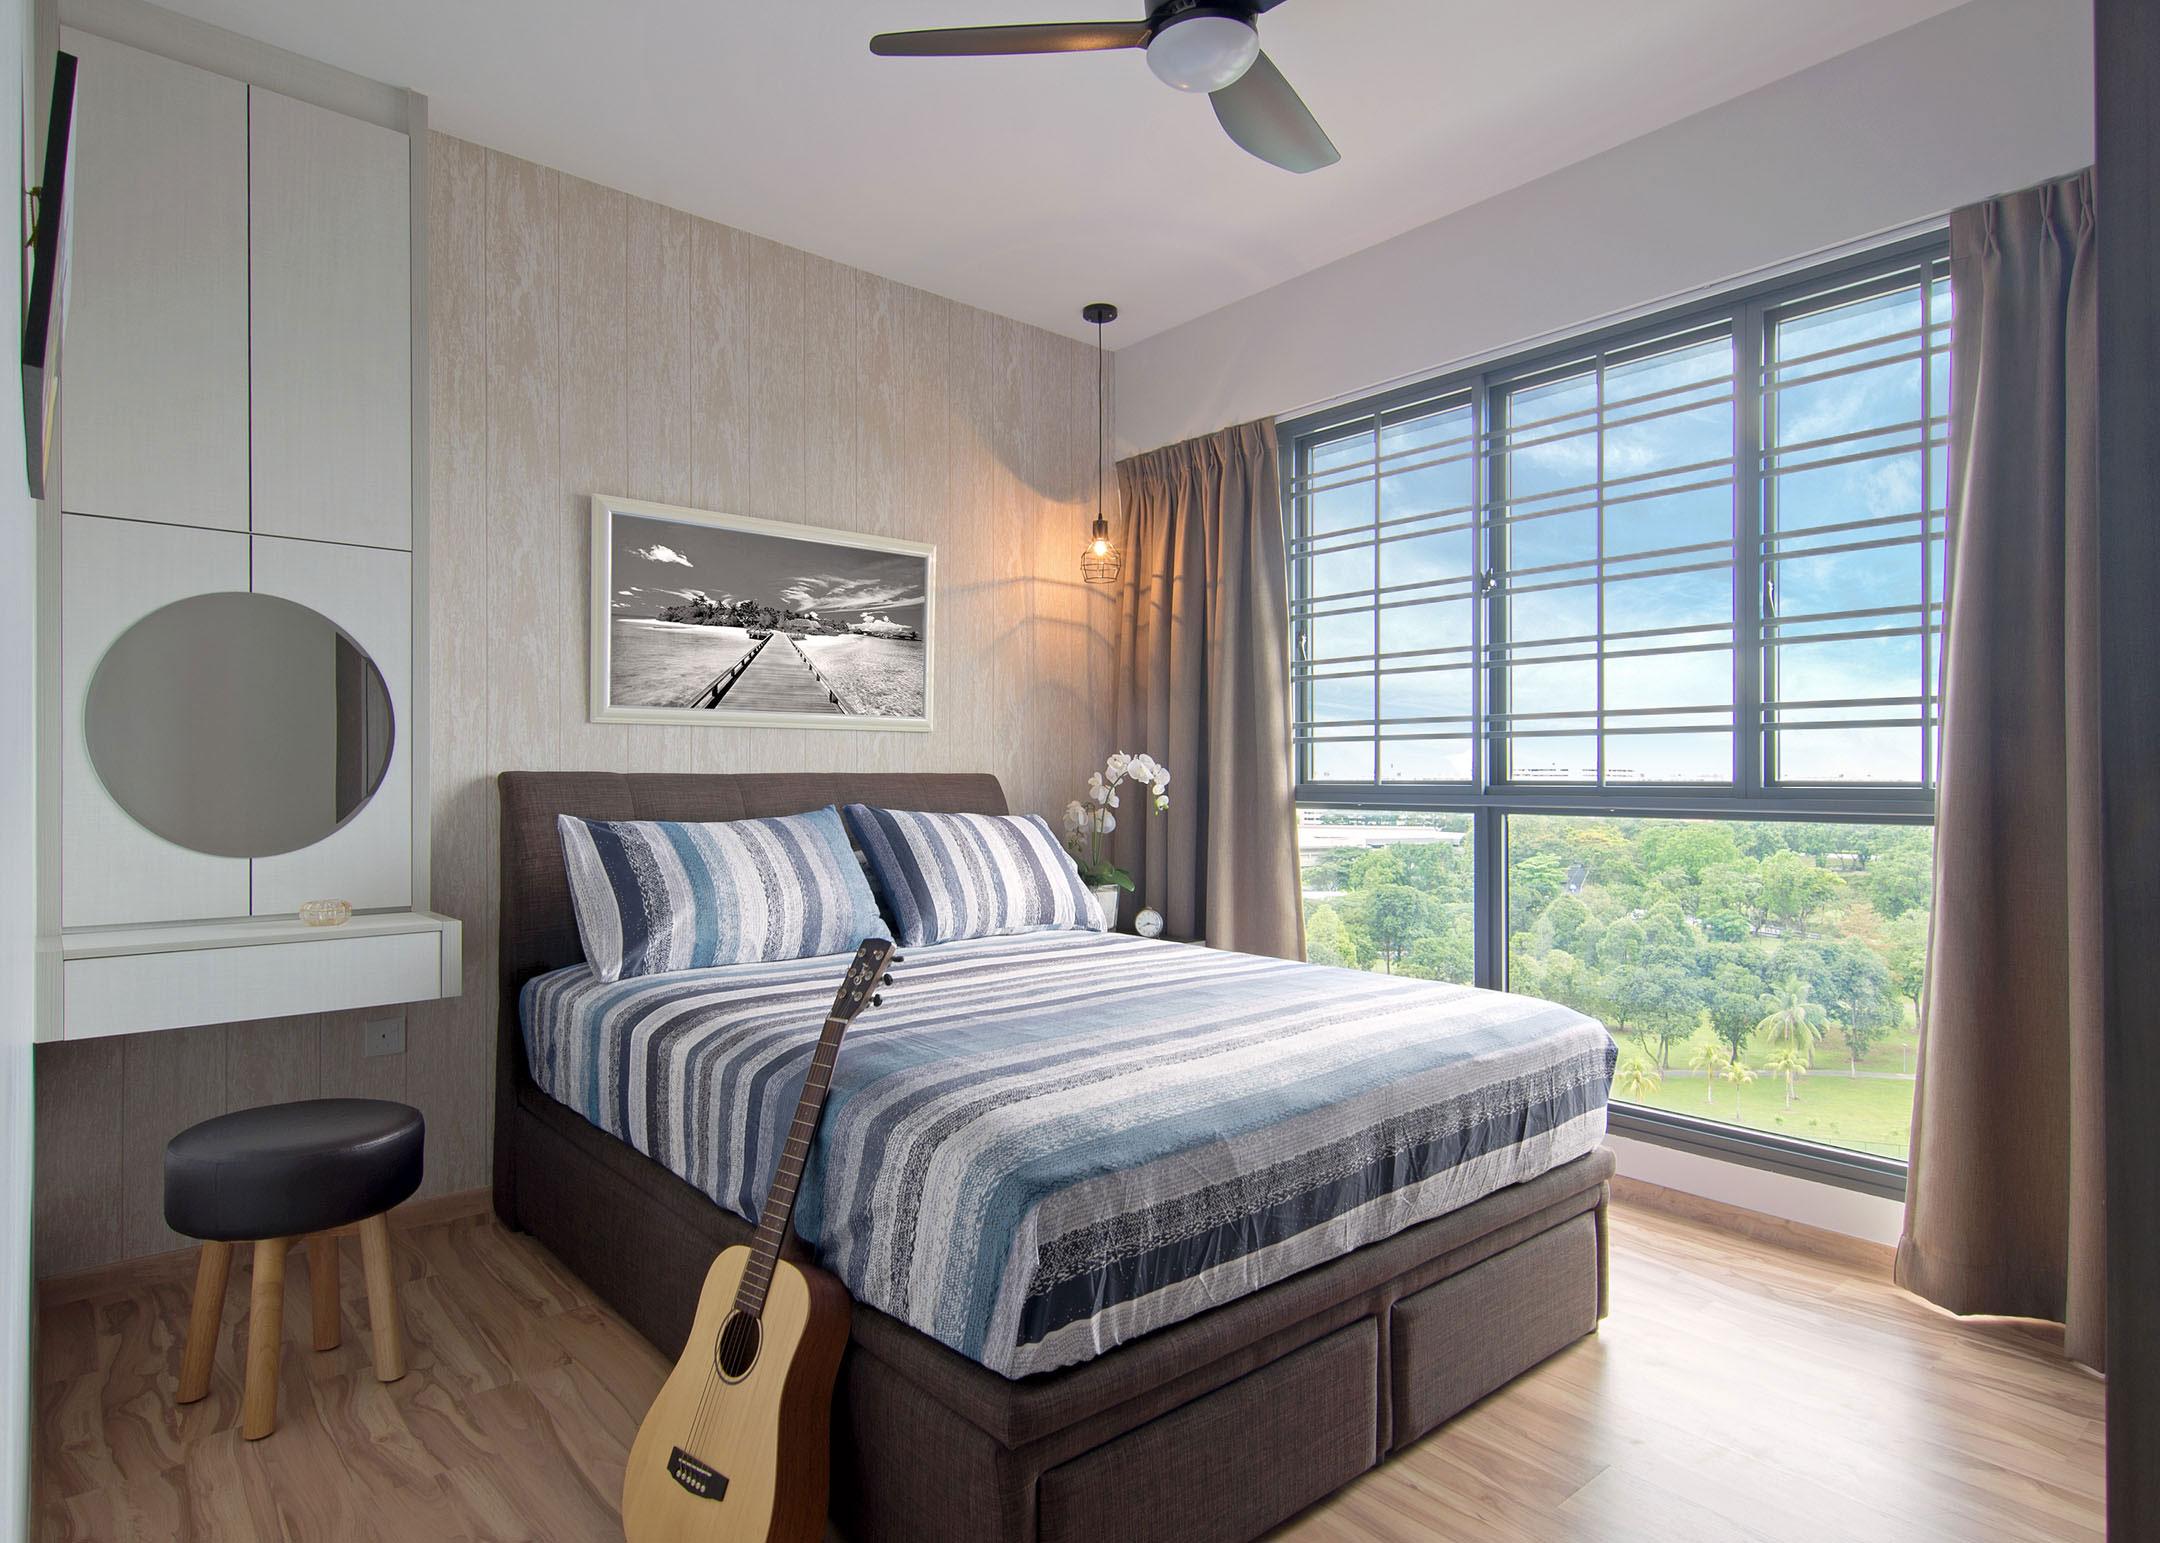 Beach house urban apartment in Singapore by Vievva Designers-11